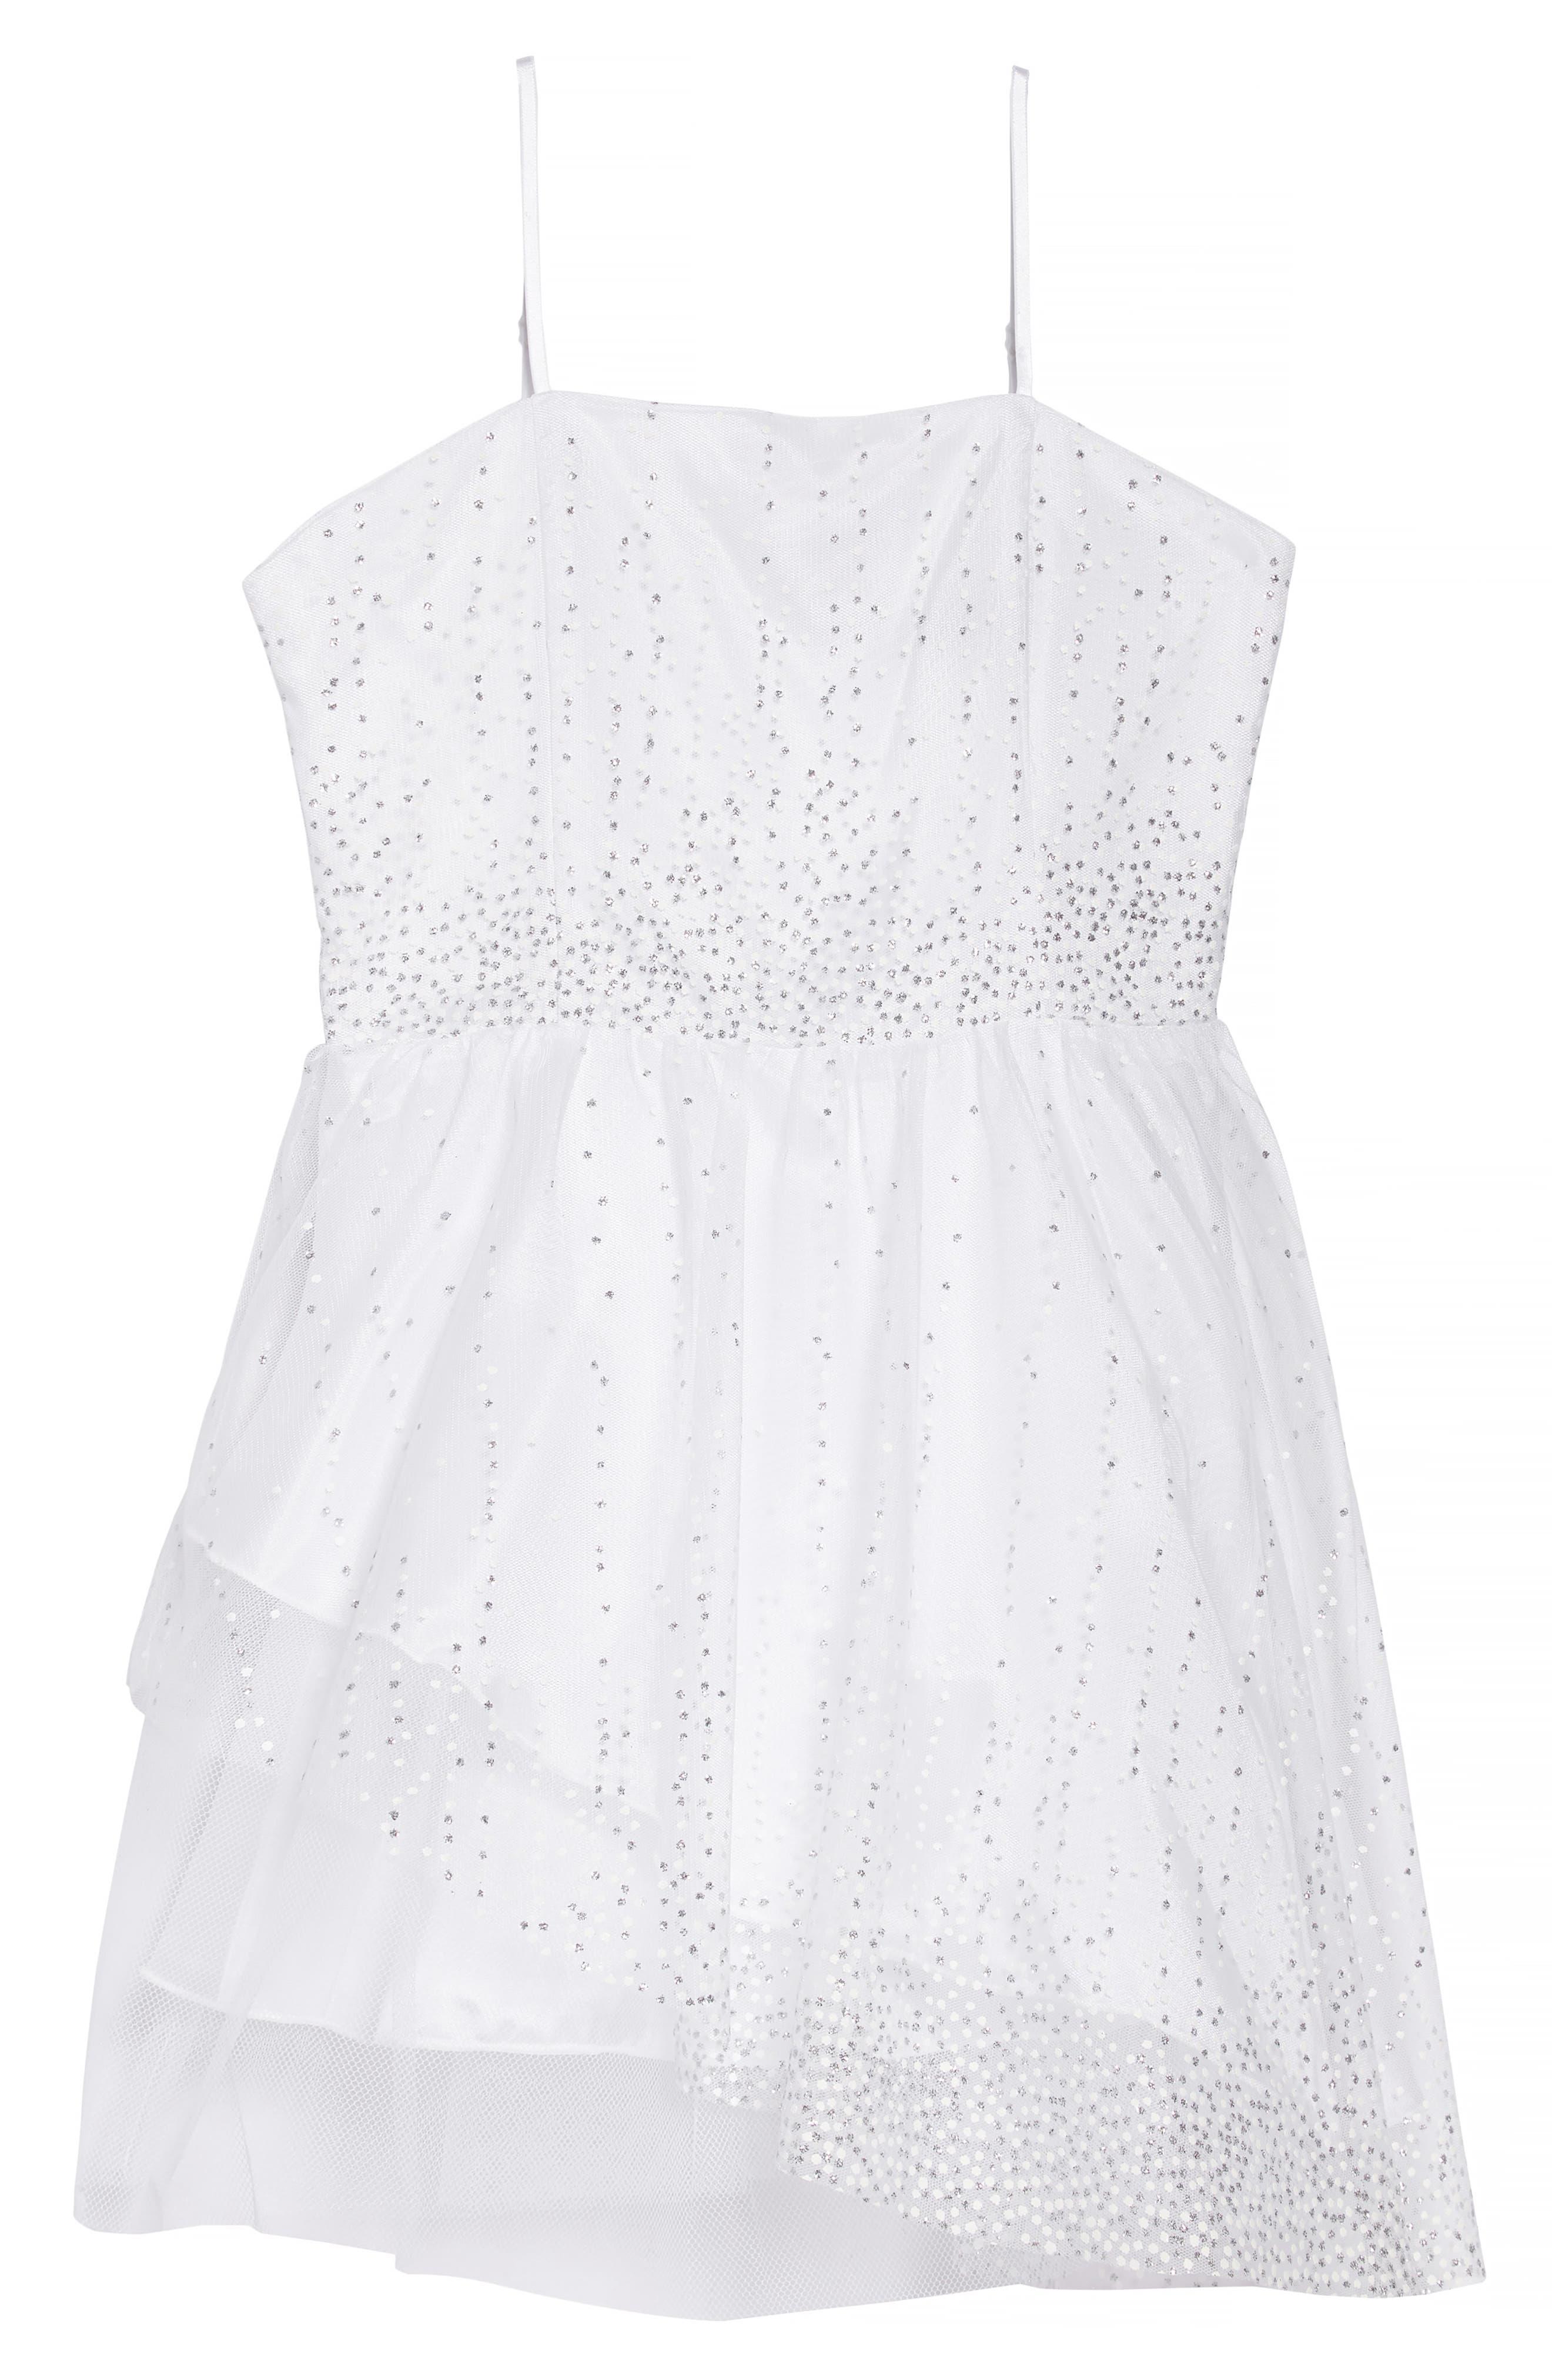 Sequin Dress,                         Main,                         color, White/ Silver